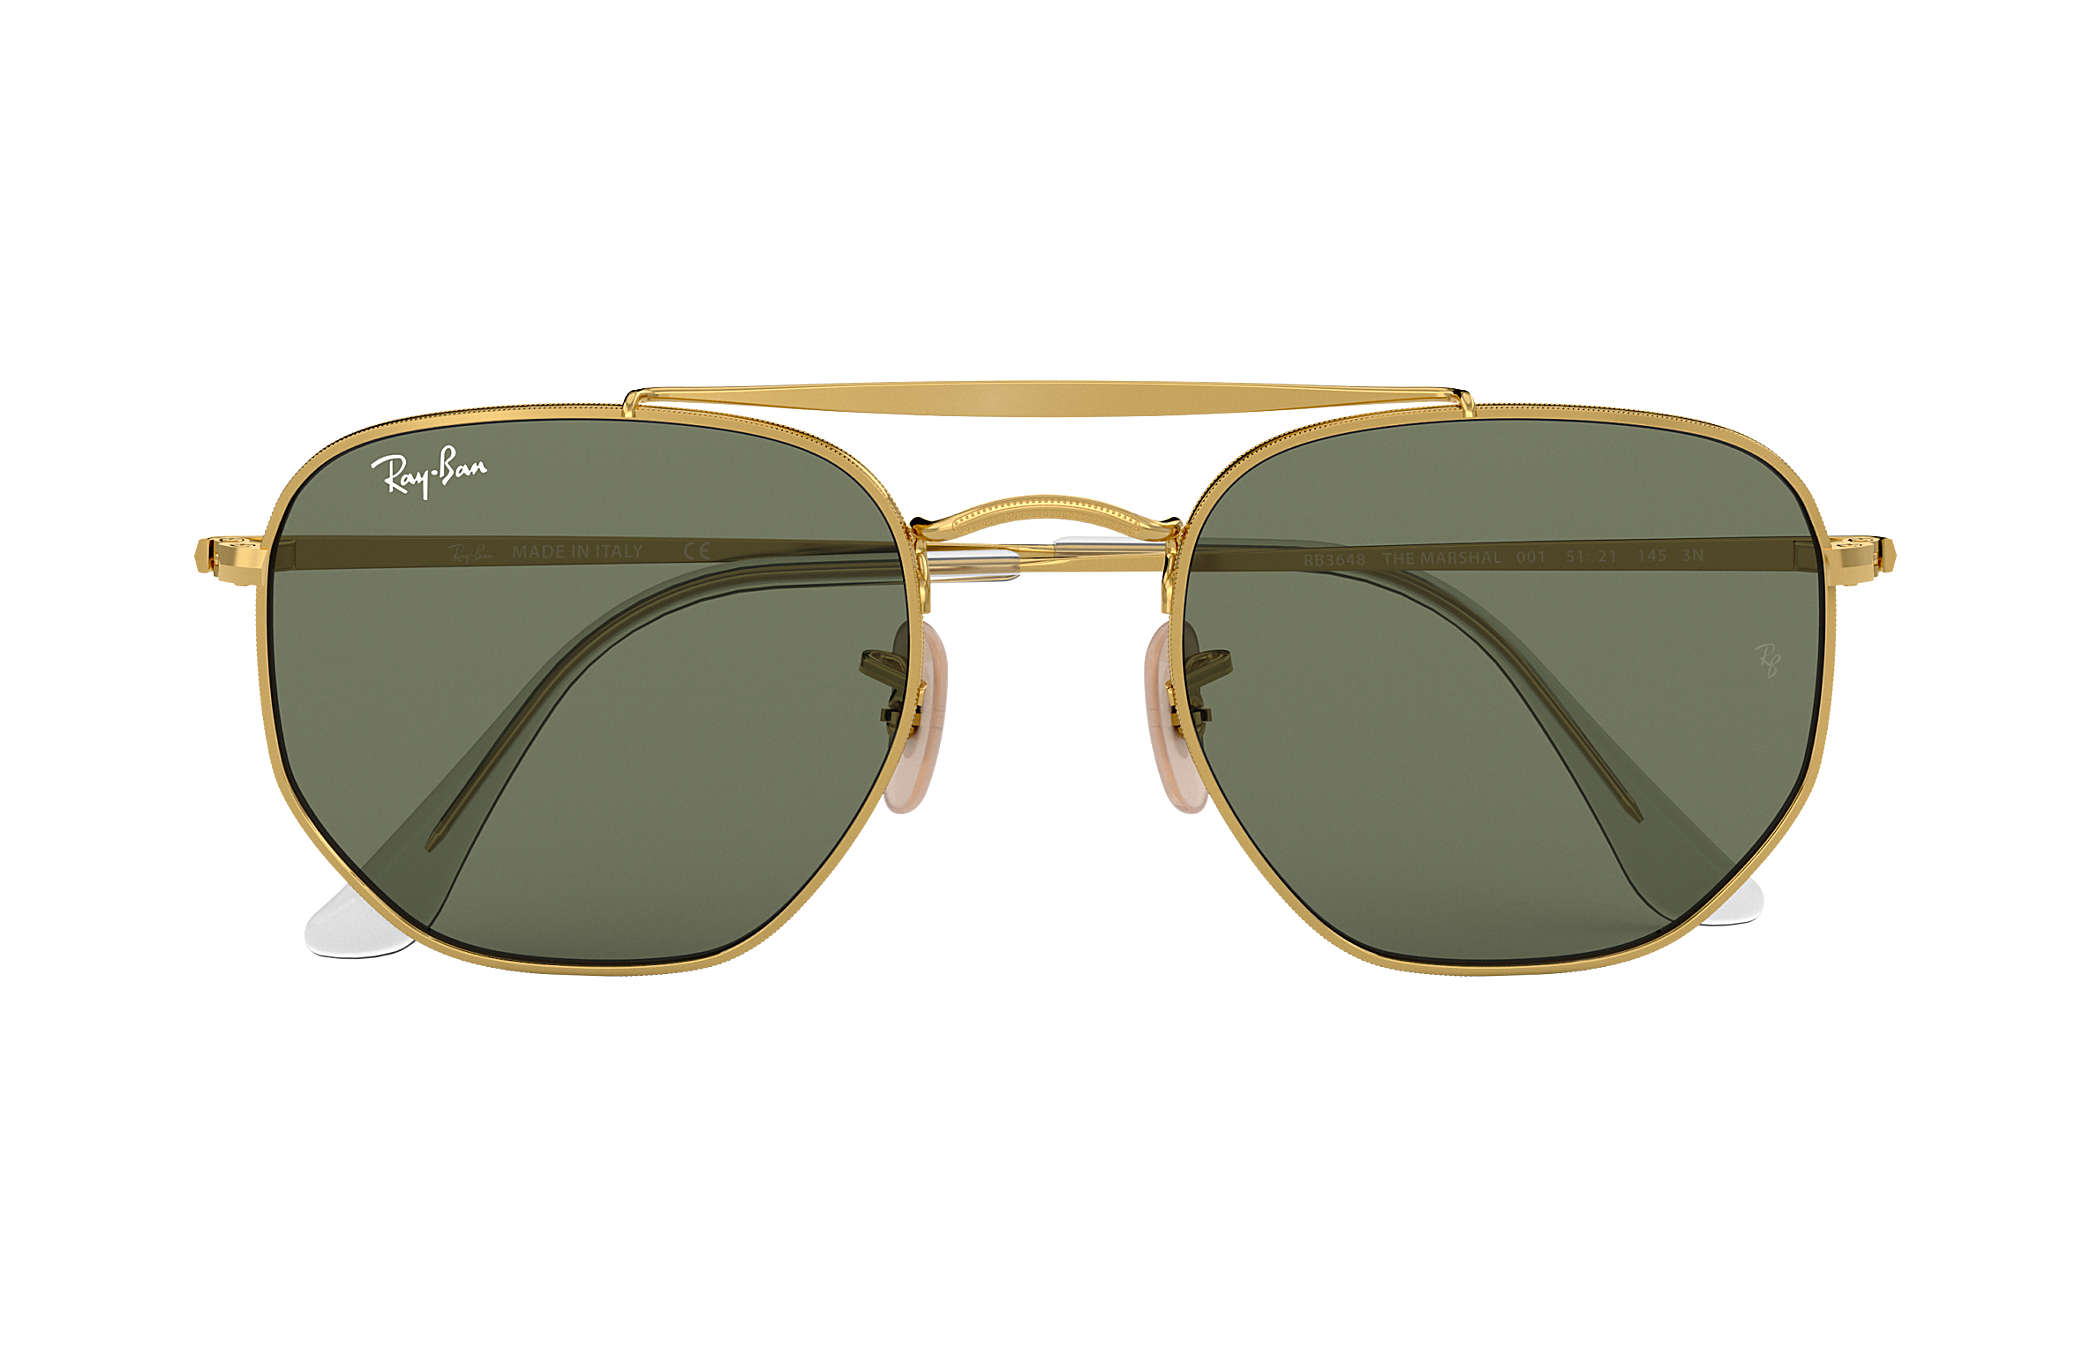 Ray Ban Men's Sunglasses | The Marshal